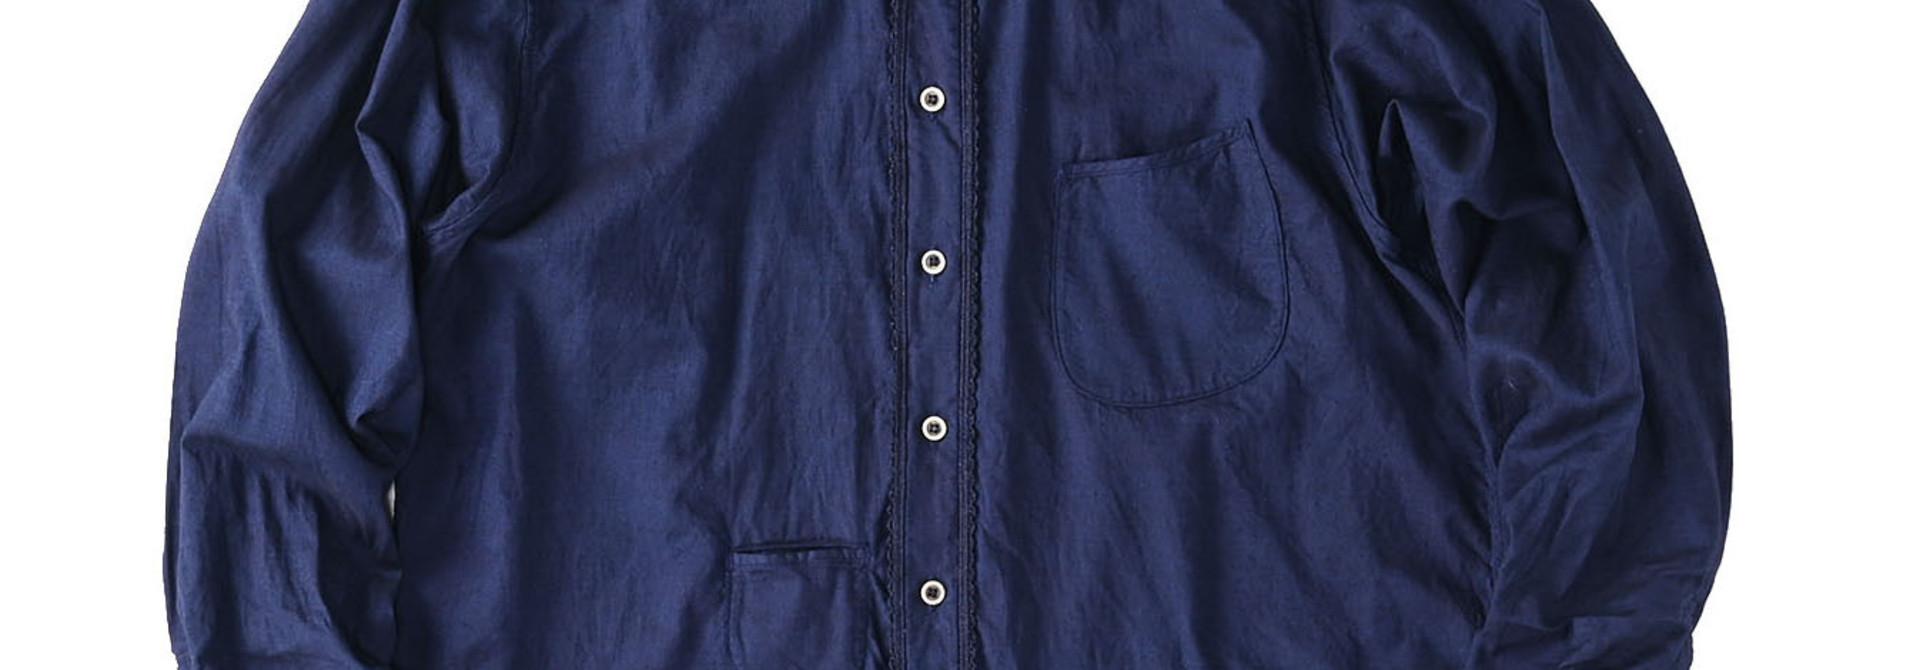 Indigo Thin Oxford 908 Ocean Lace Shirt (0621)